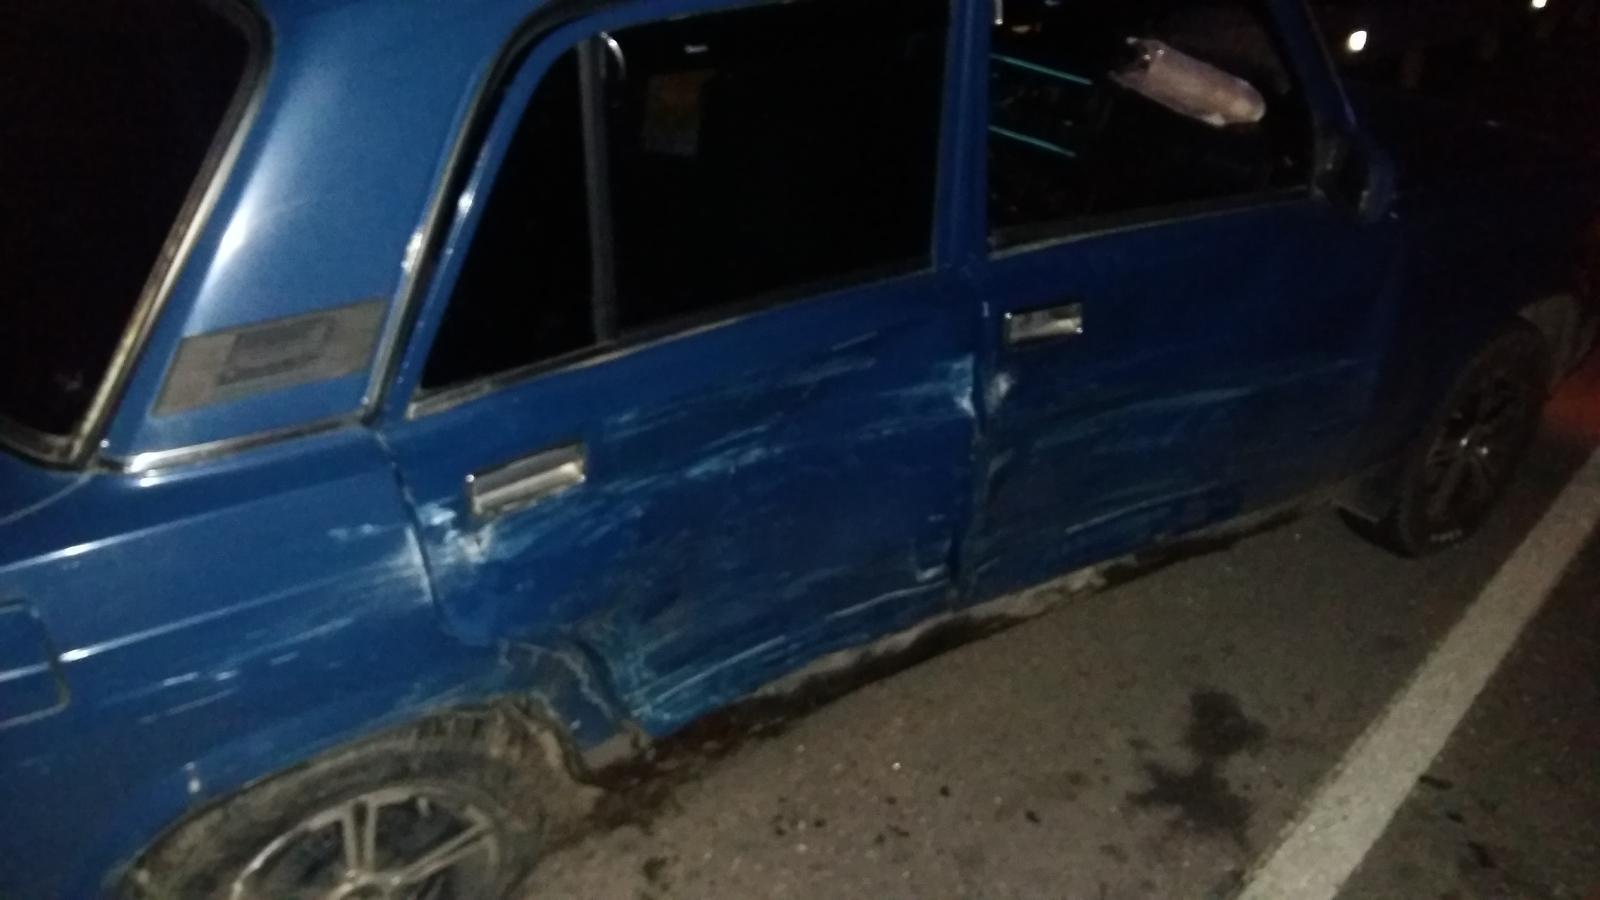 Два человека пострадали в ДТП на Южном обходе Тамбова